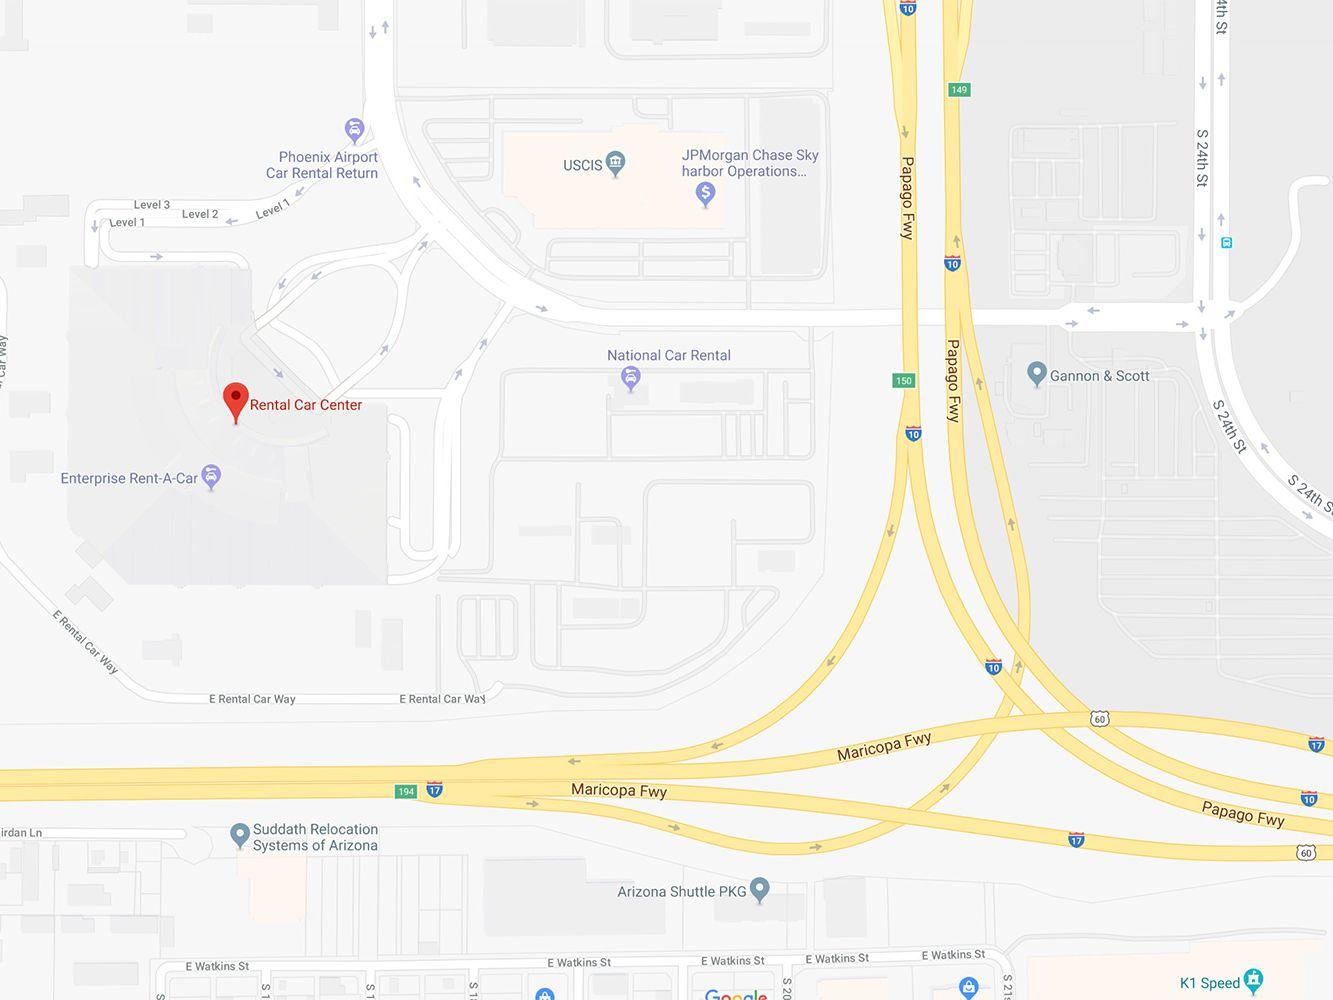 Google Map Of Arizona.Phoenix Airport Rental Car Center Map And Directions